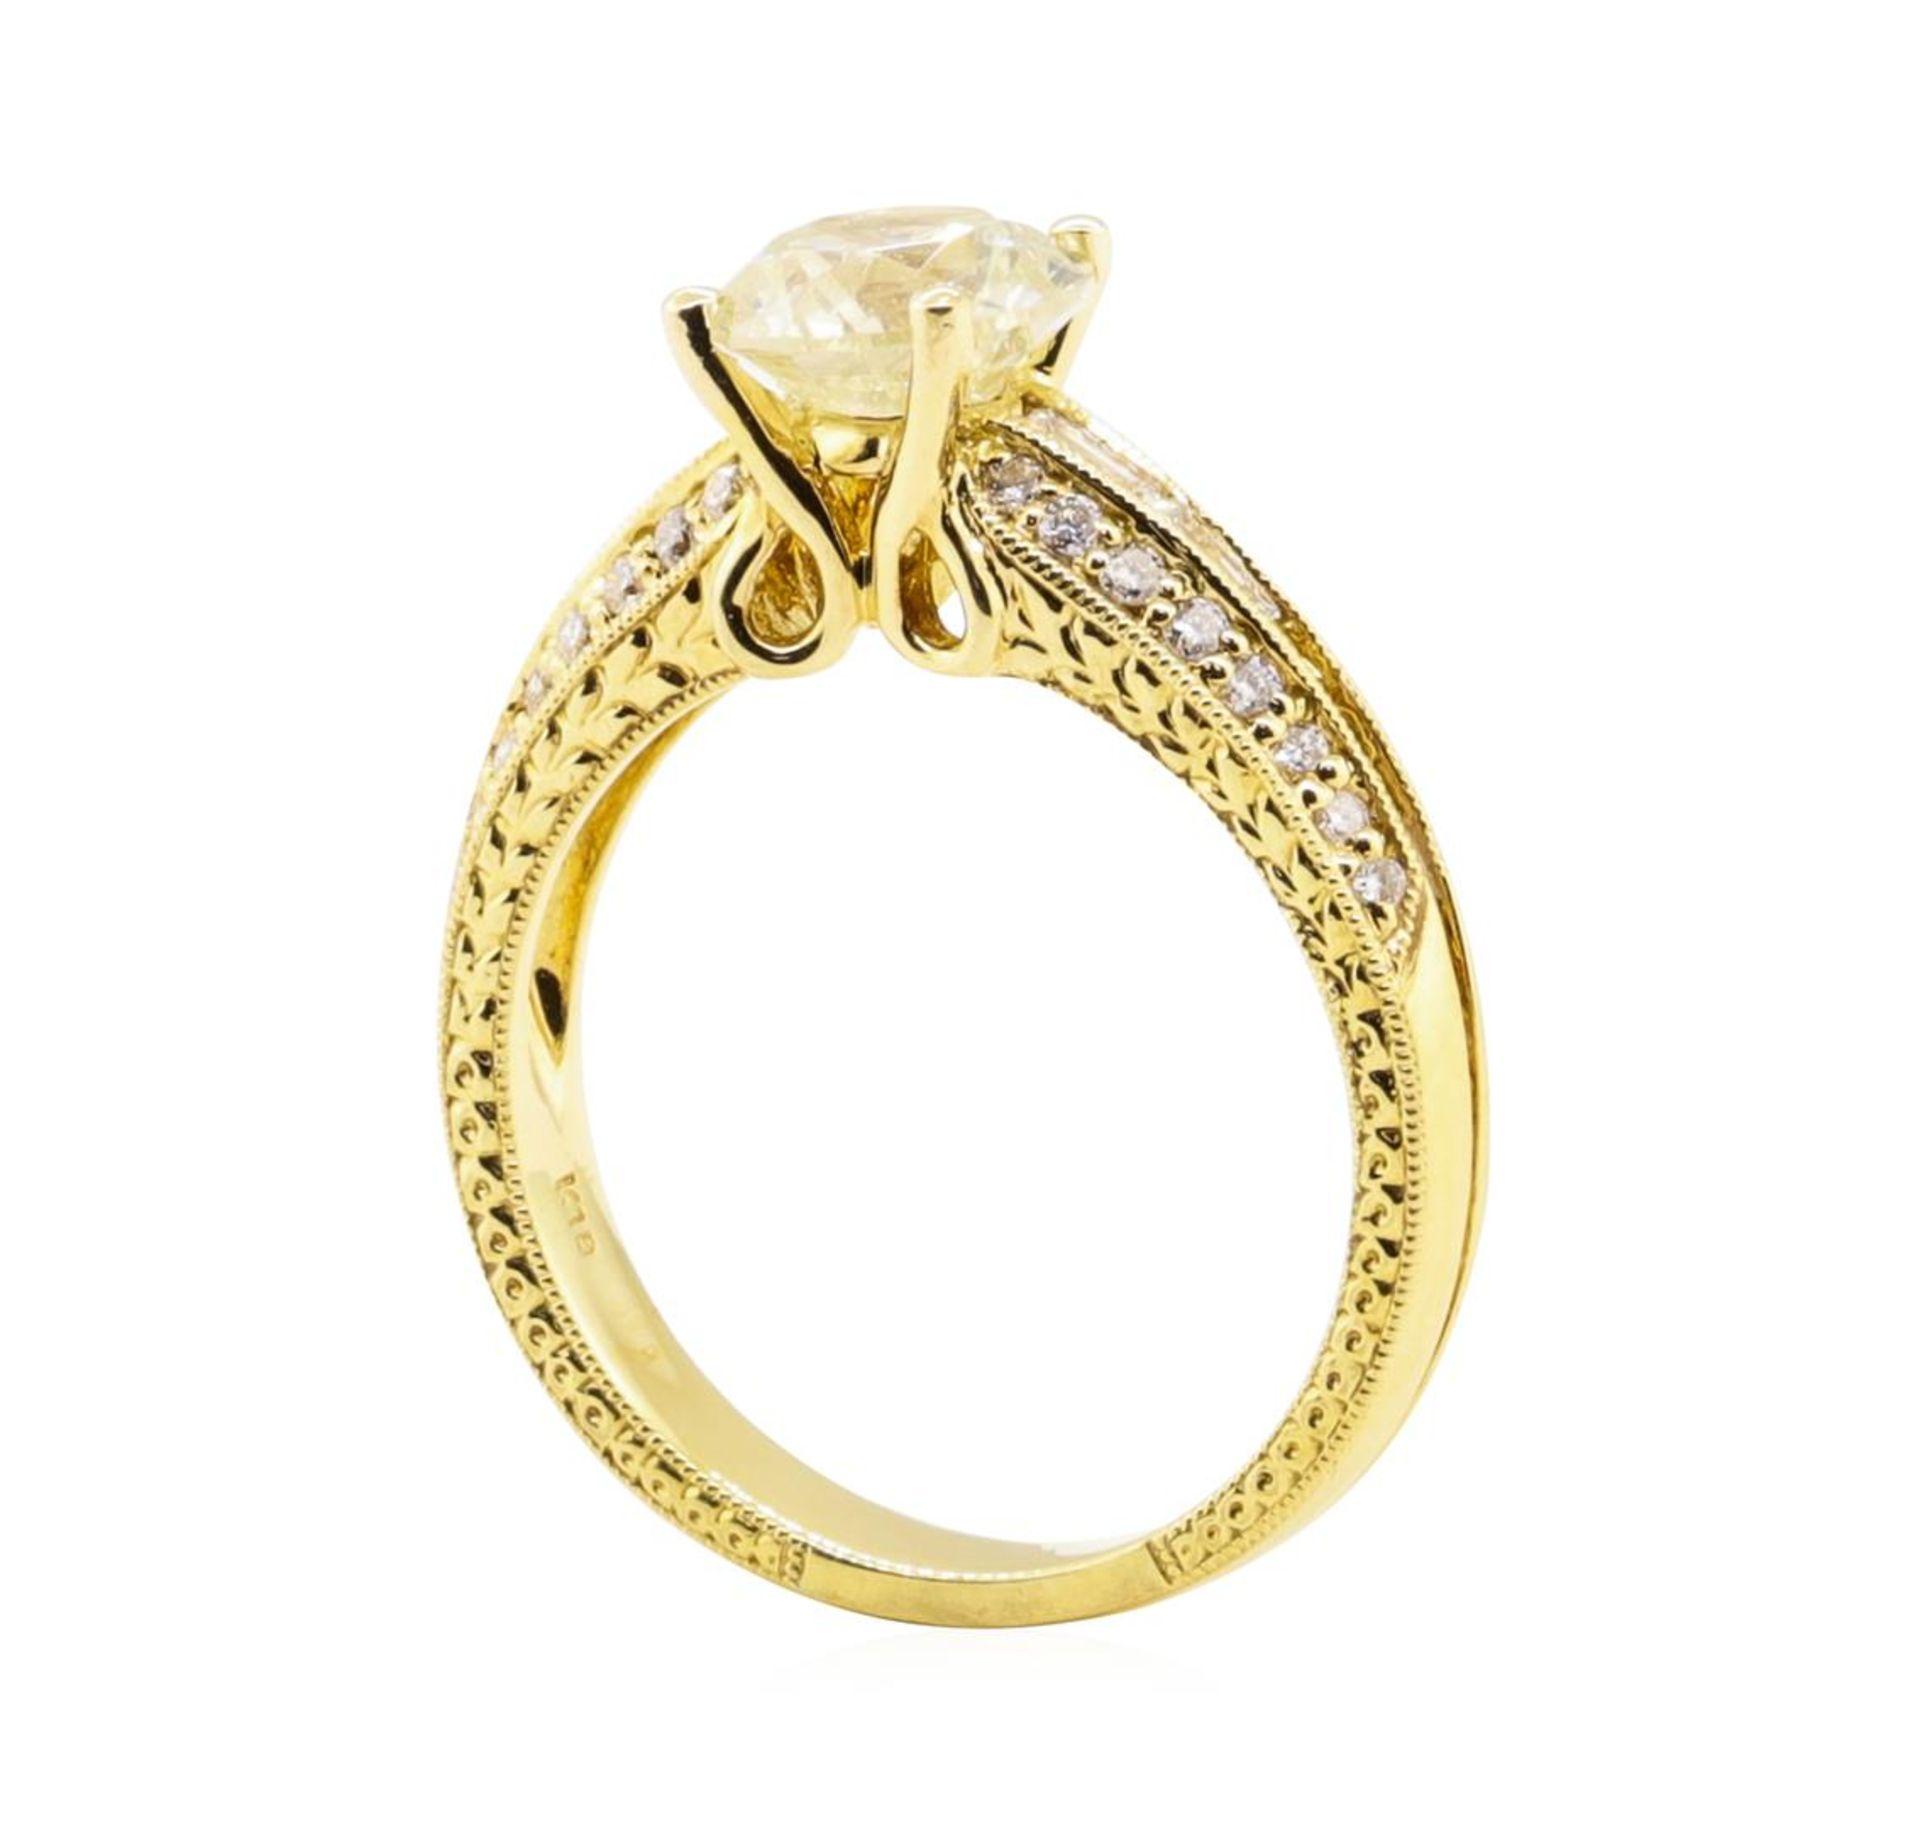 1.67ct Diamond Ring - 18KT Yellow Gold - Image 4 of 5